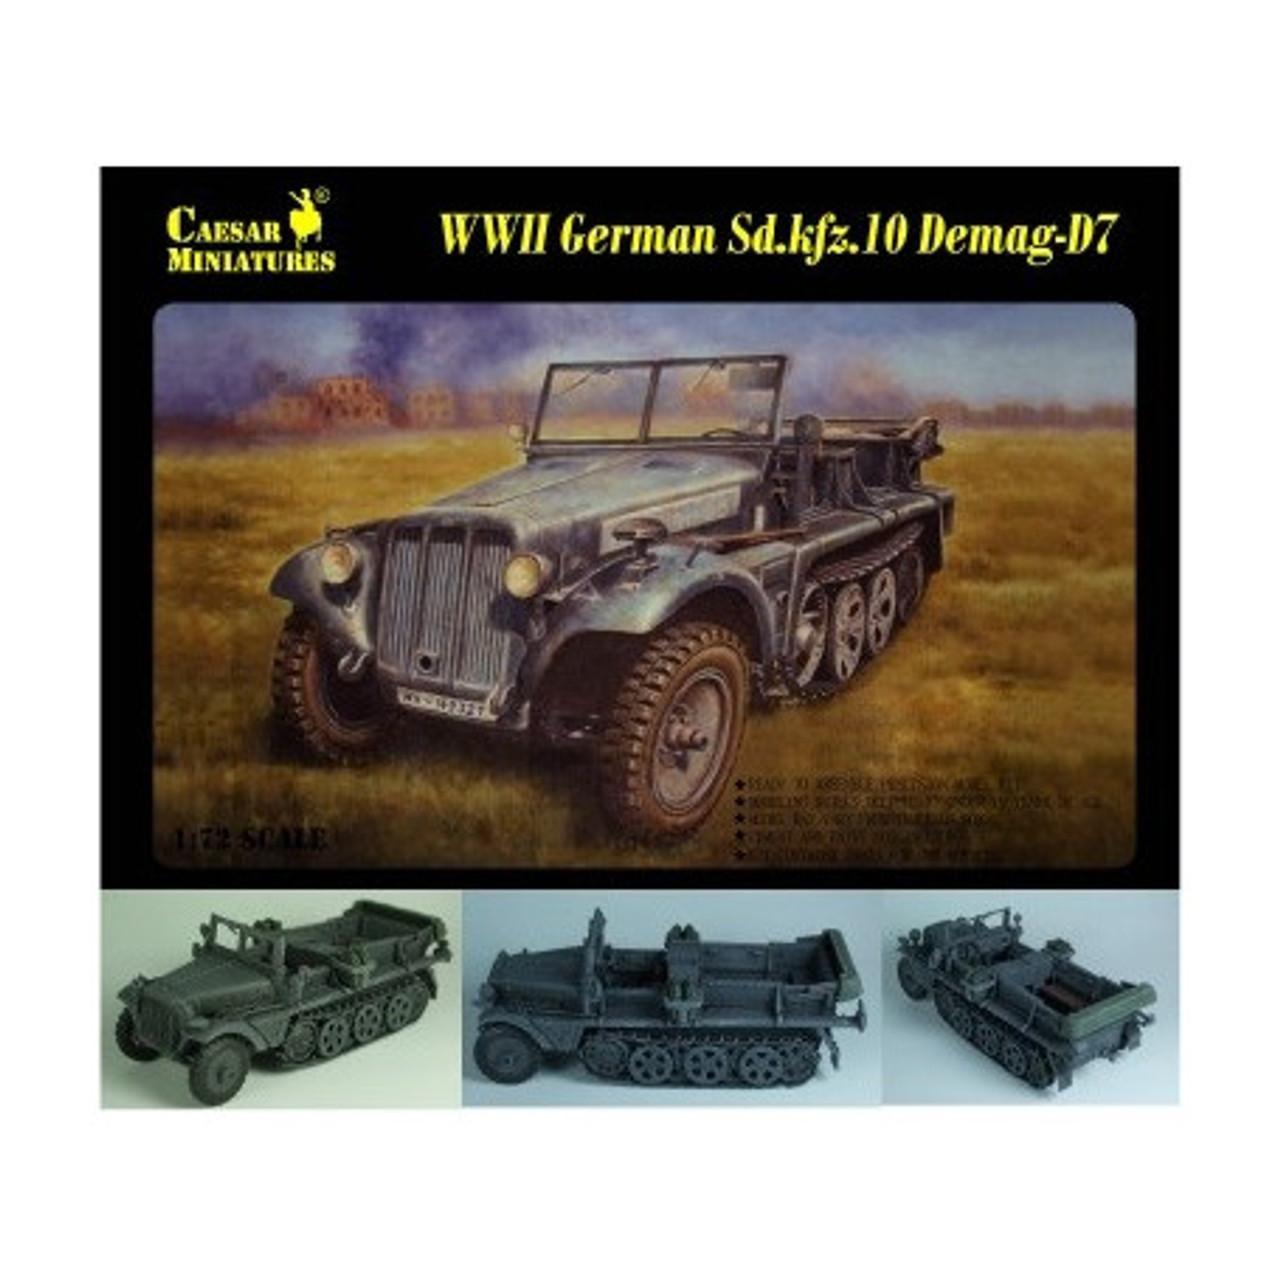 Caesar Miniatures 7204 WWII German Sd.kfz.10 Demag